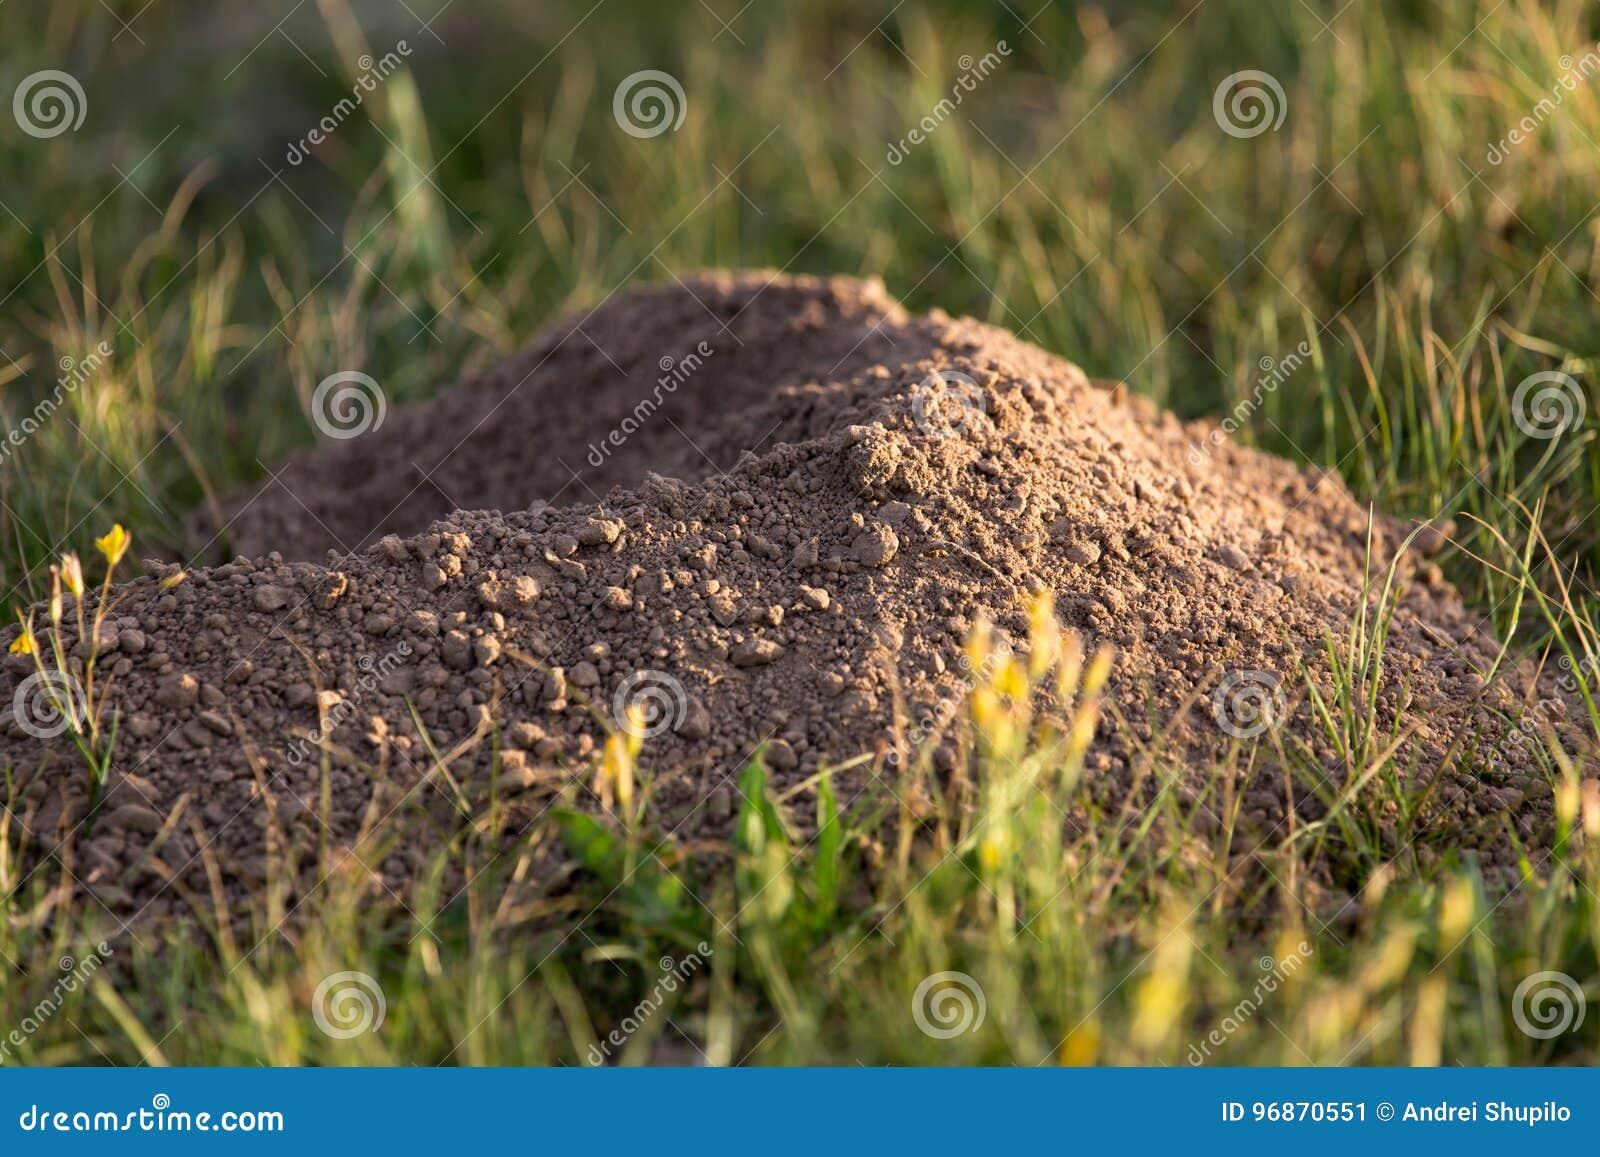 Excavated soil mole nature